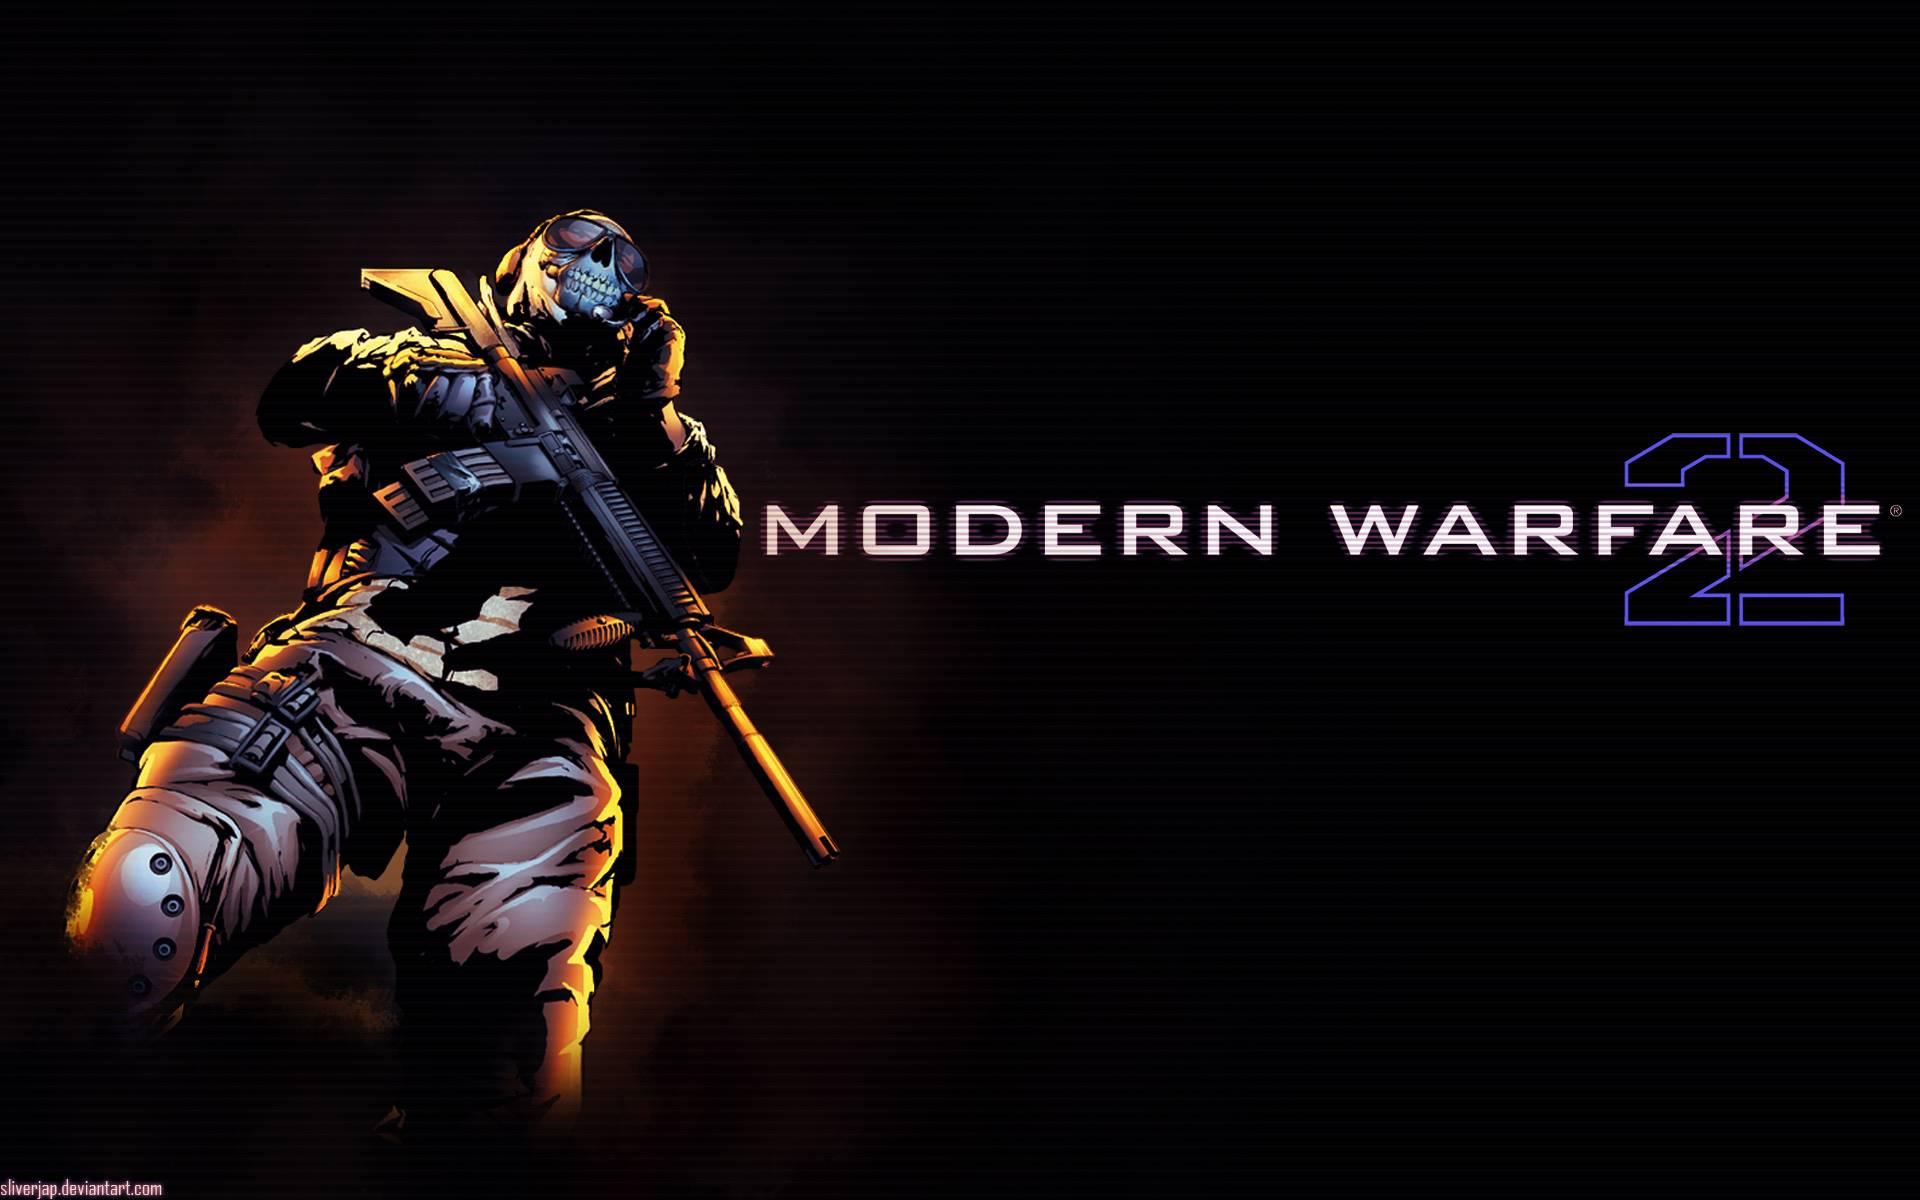 Custom Warfare Modernwarfare Photos Modern Wallpapers For Desktop 1920x1200